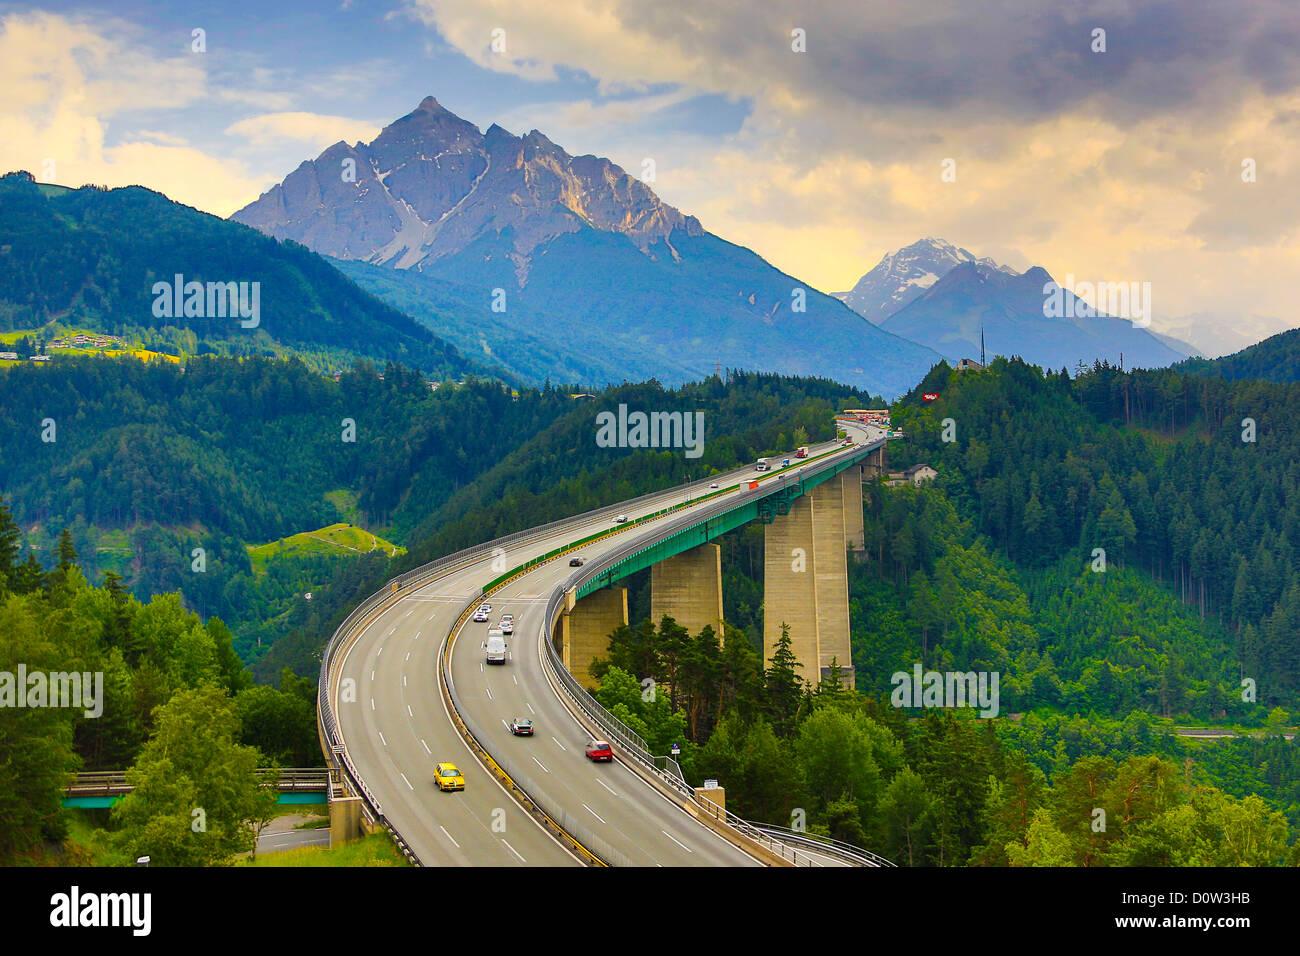 Austria, Brenner, Pass, Europabrücke, Bridge, Tirol, alps, highway, brennero, mountain, traffic, - Stock Image